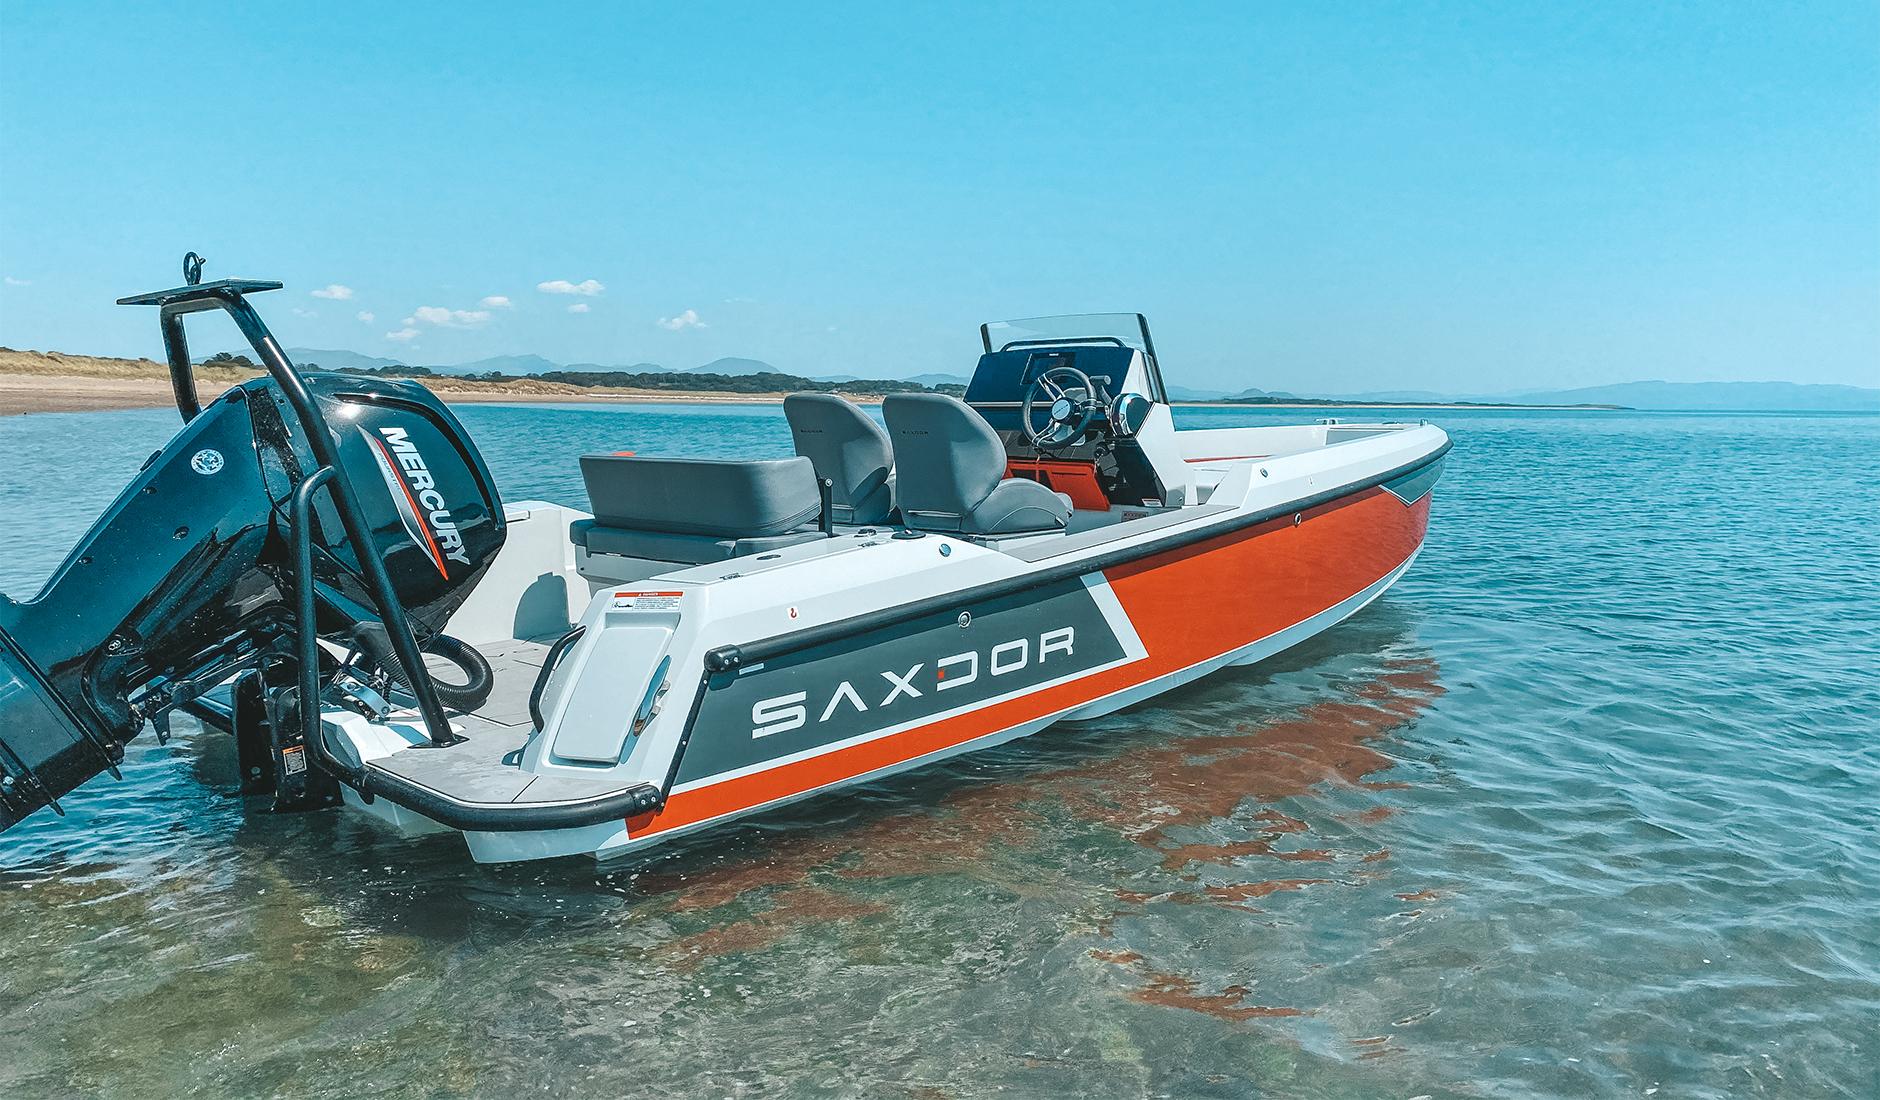 Saxdor 200 Sport Фото № 8